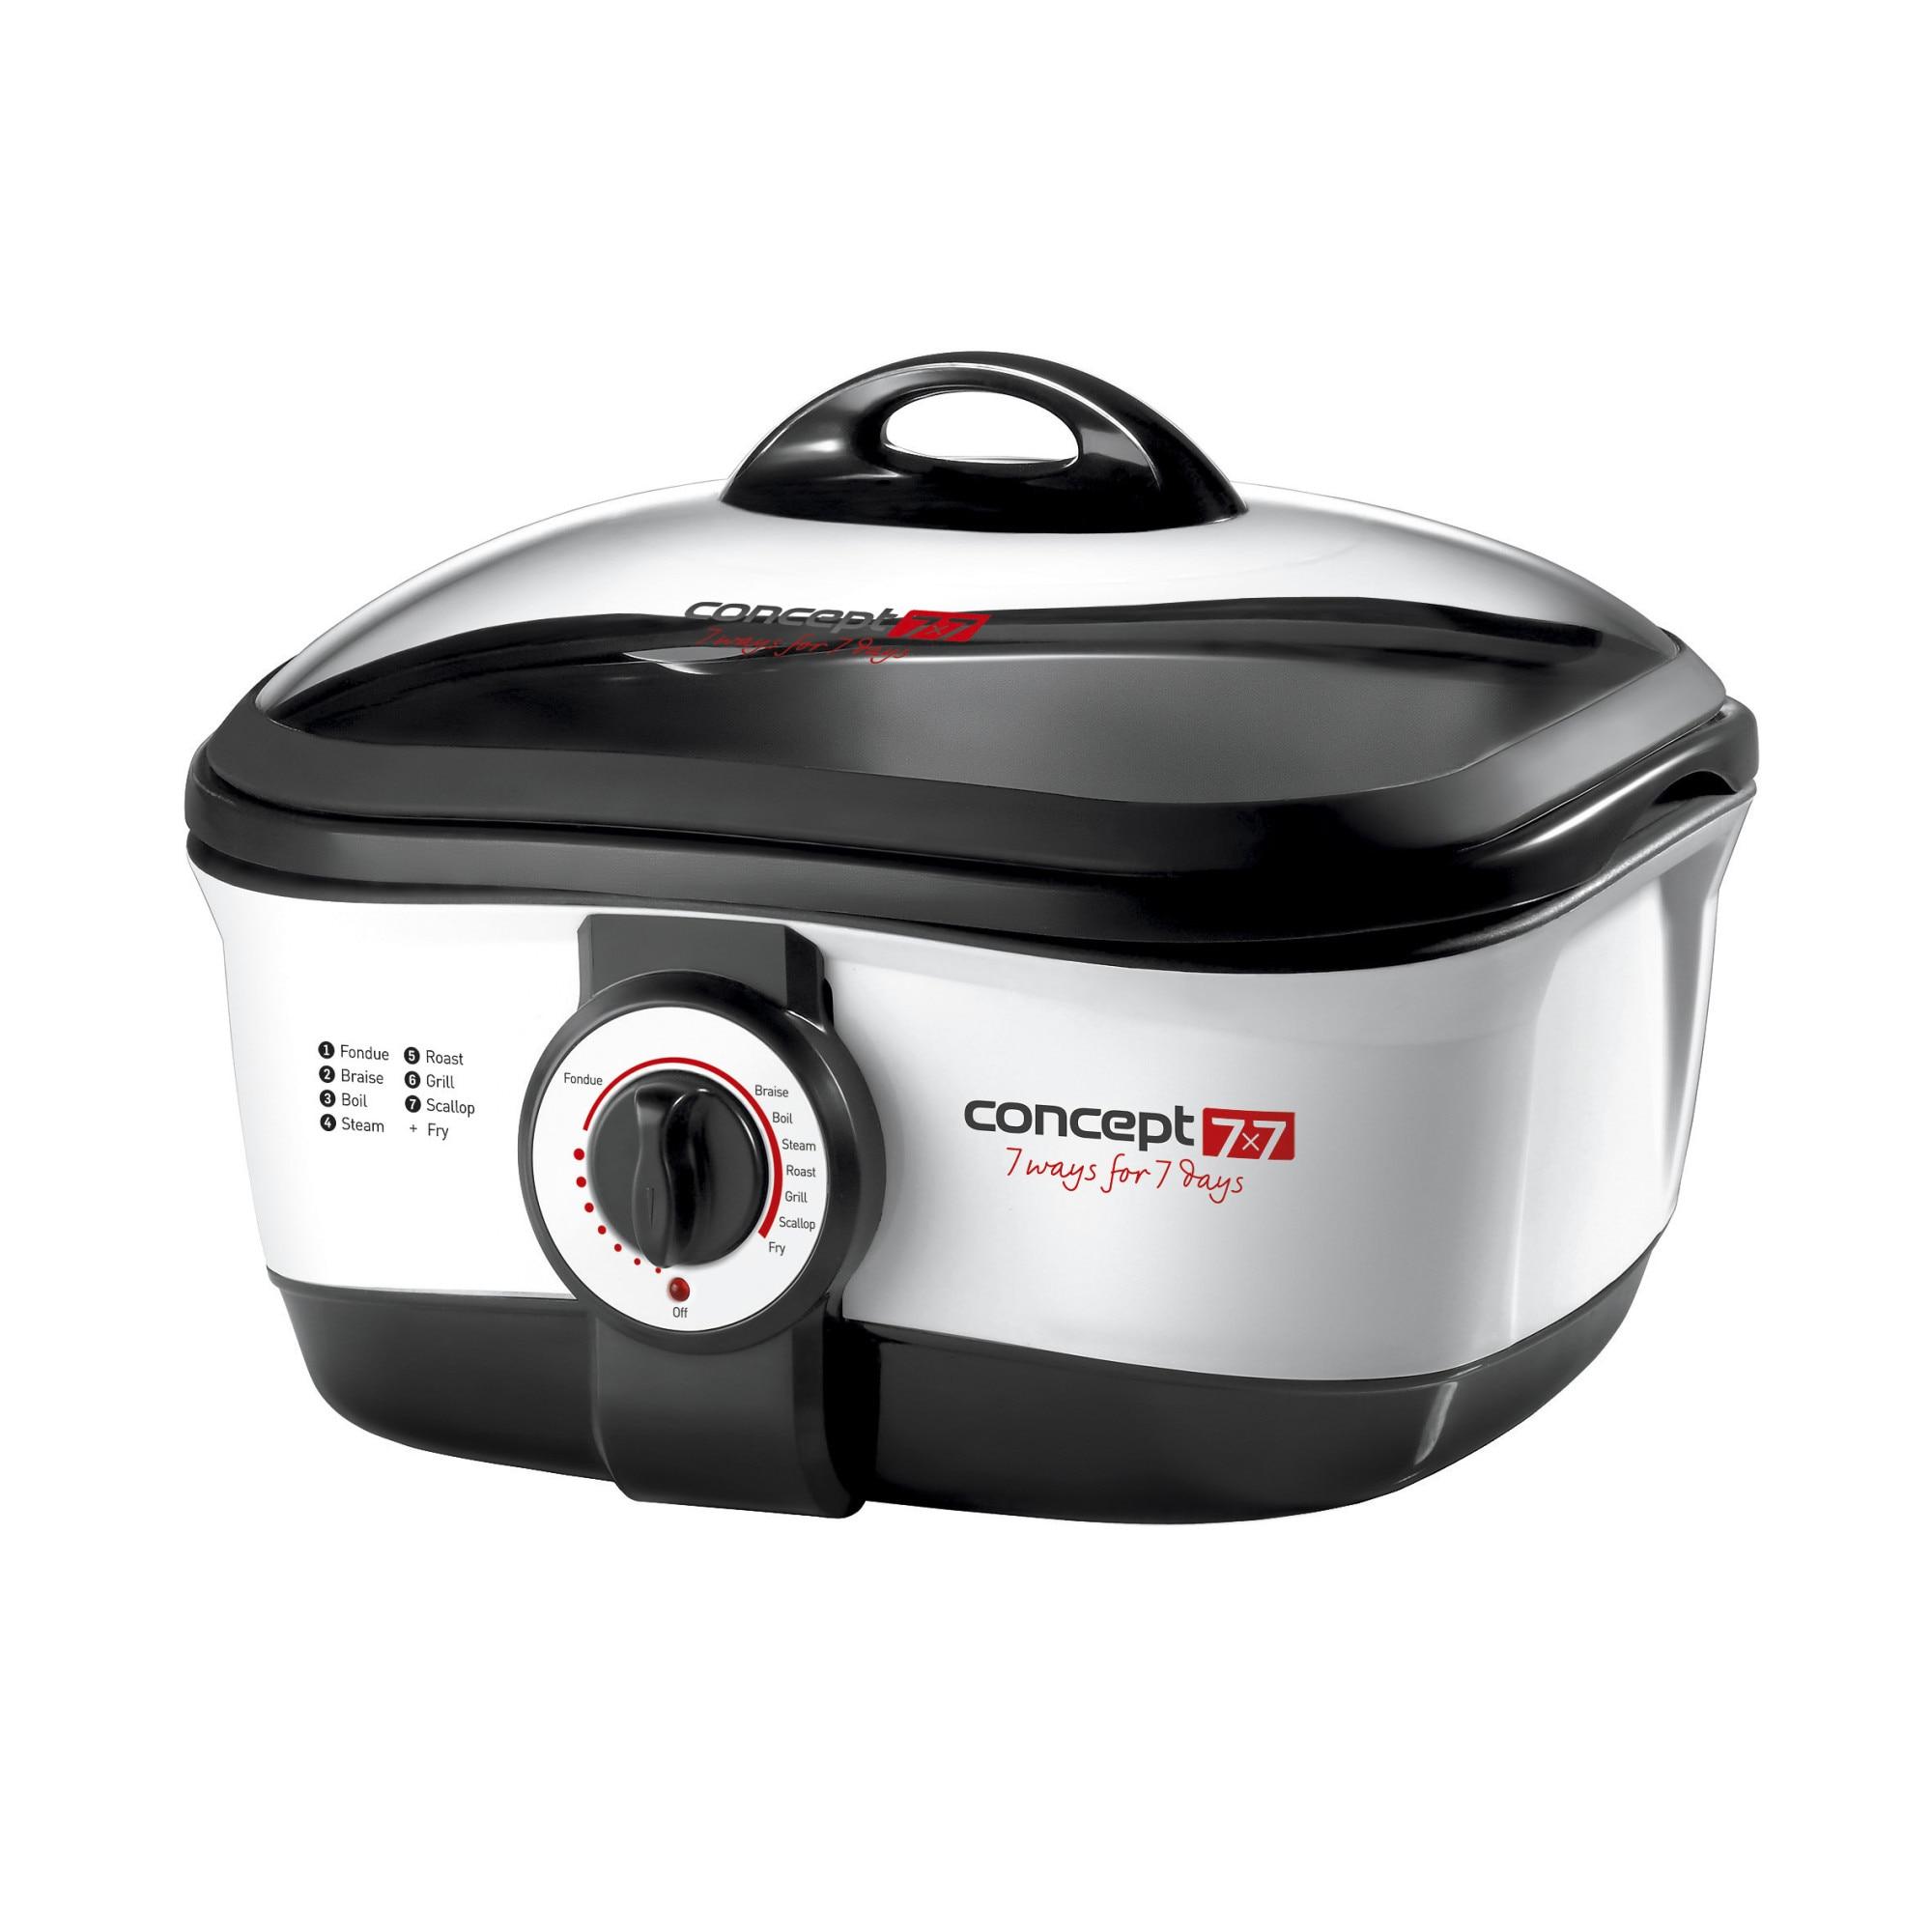 Fotografie Multicooker Concept CK7070, 1650 W, 4 L, 7 programe, Set fondue inclus, Negru/Inox